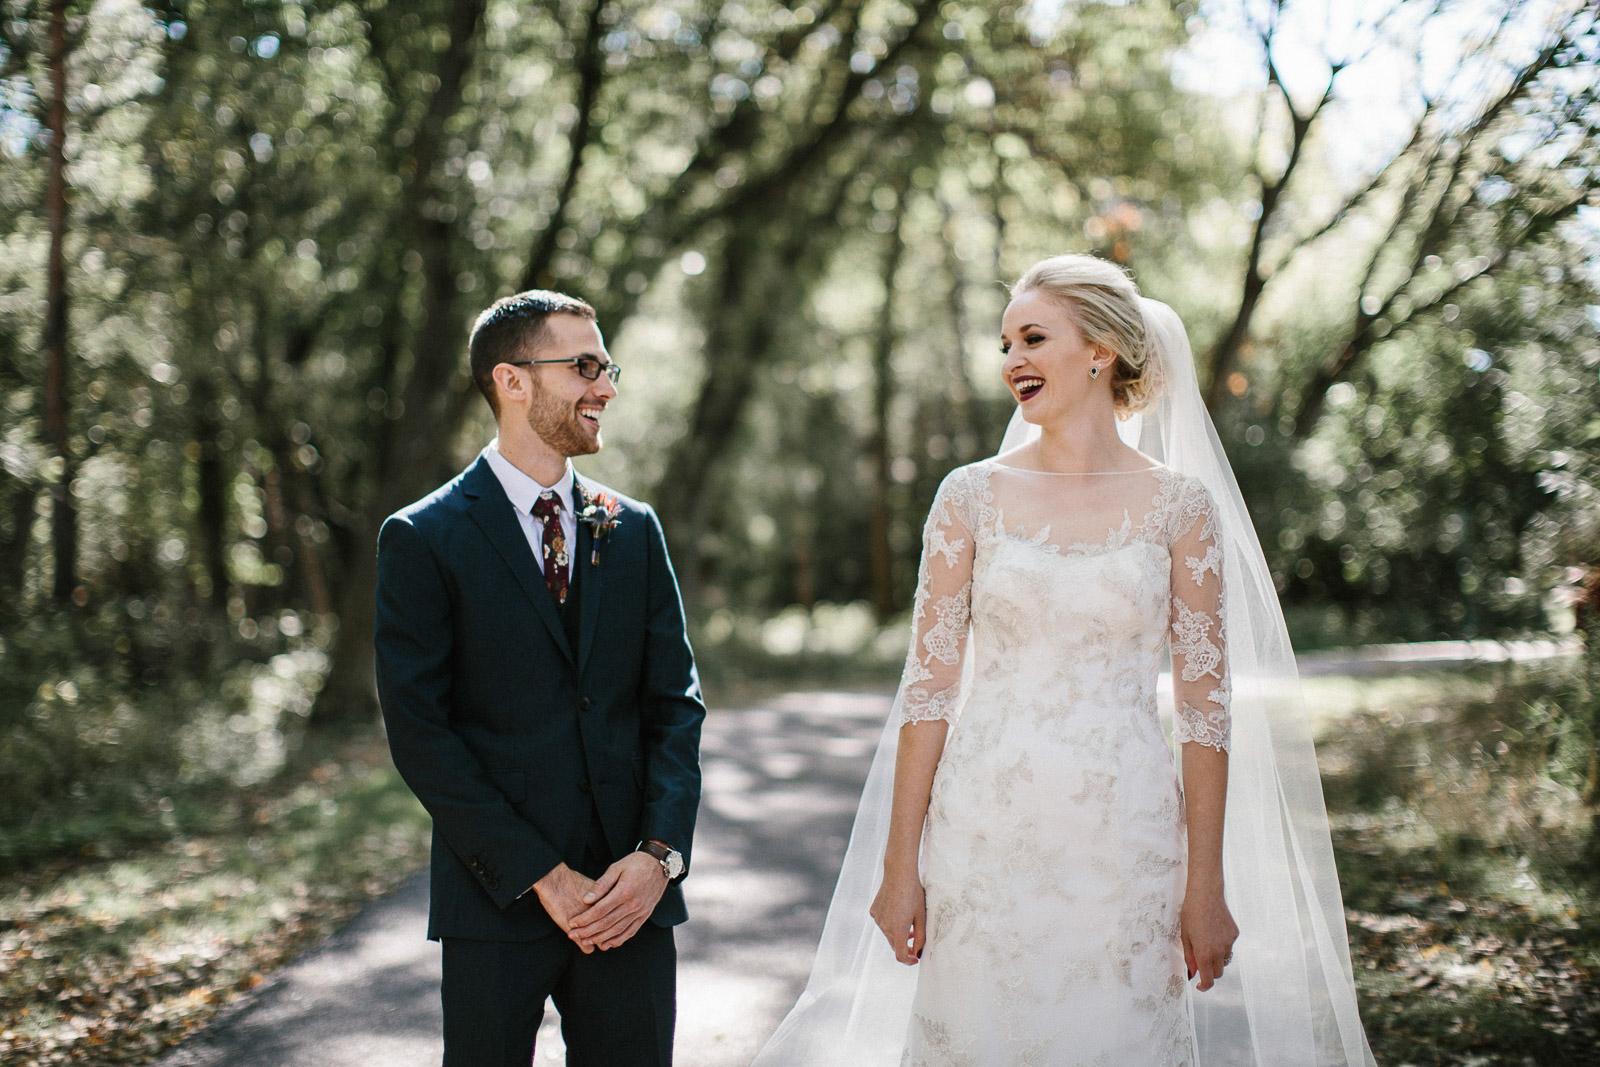 Jenna&Austin_SiouxFalls_Wedding_Photographer_035.jpg